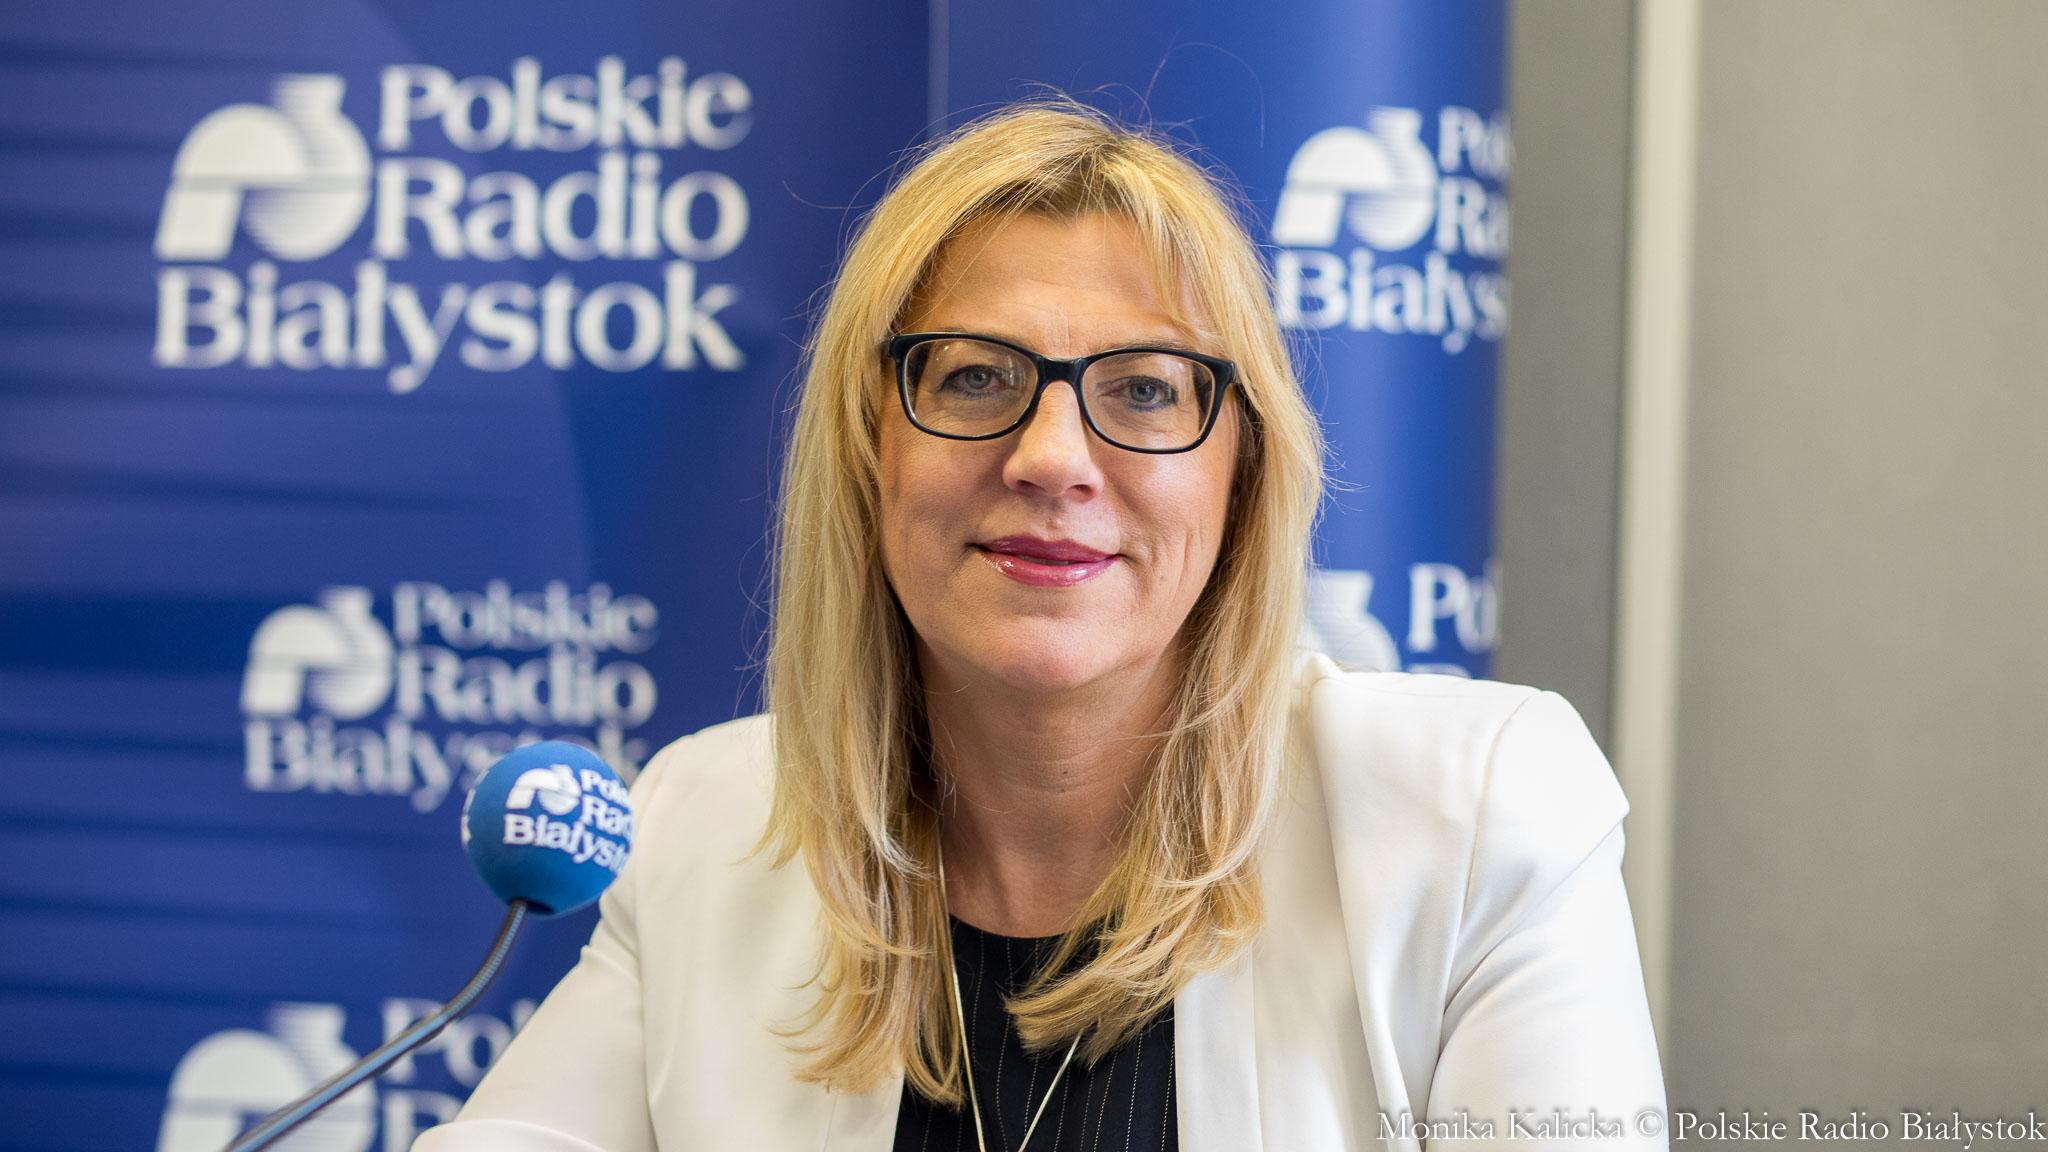 Agnieszka Rzeszewska, fot. Monika Kalicka